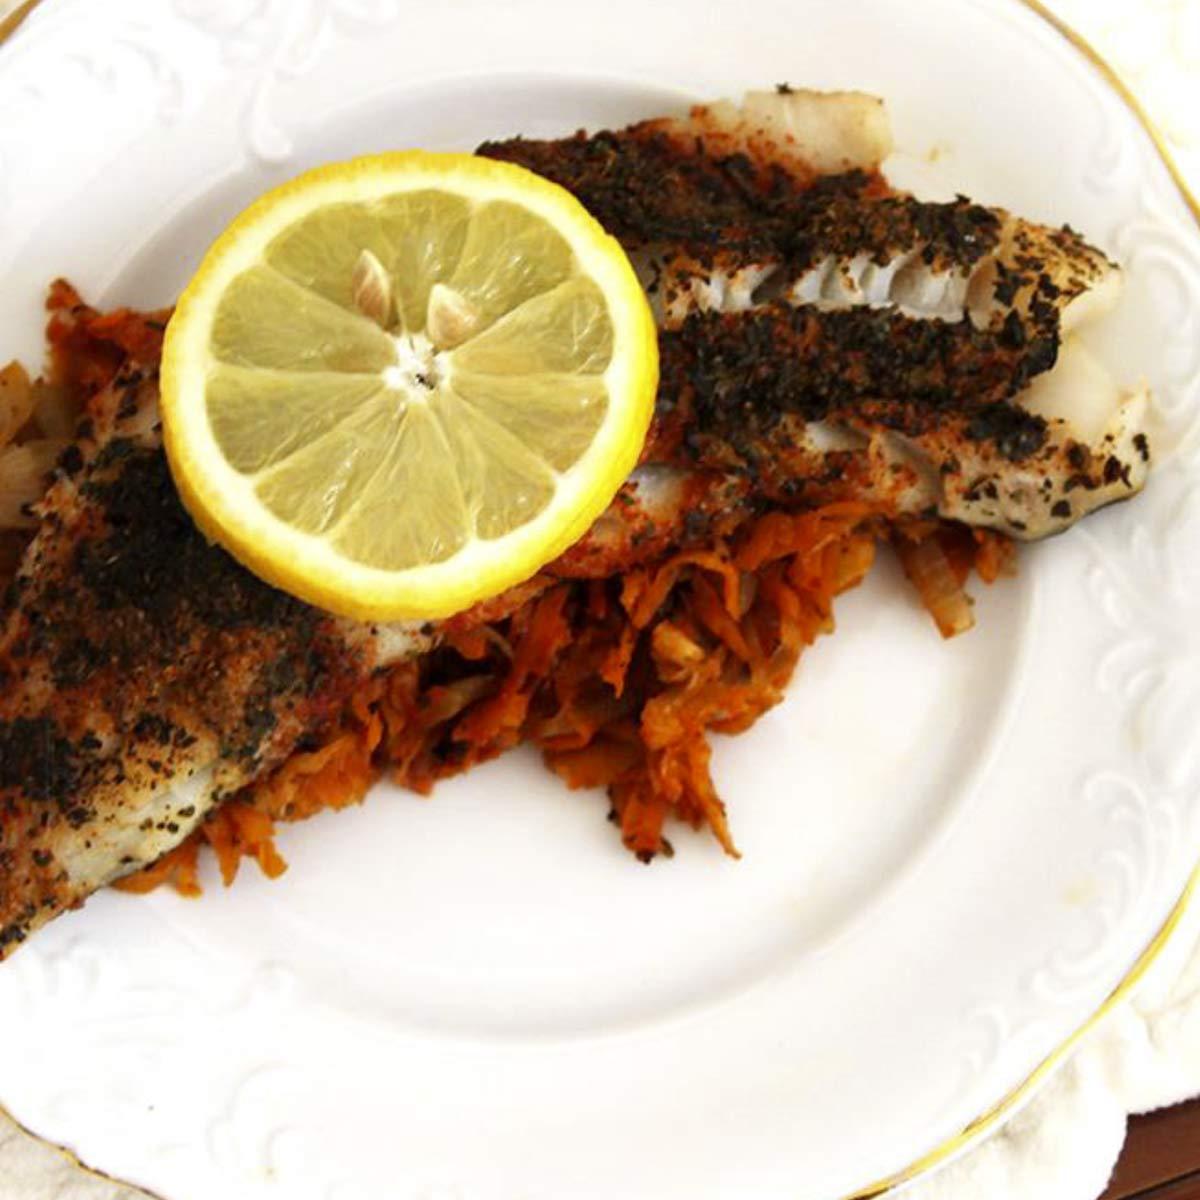 31-fit-ryba-po-grecku.jpg